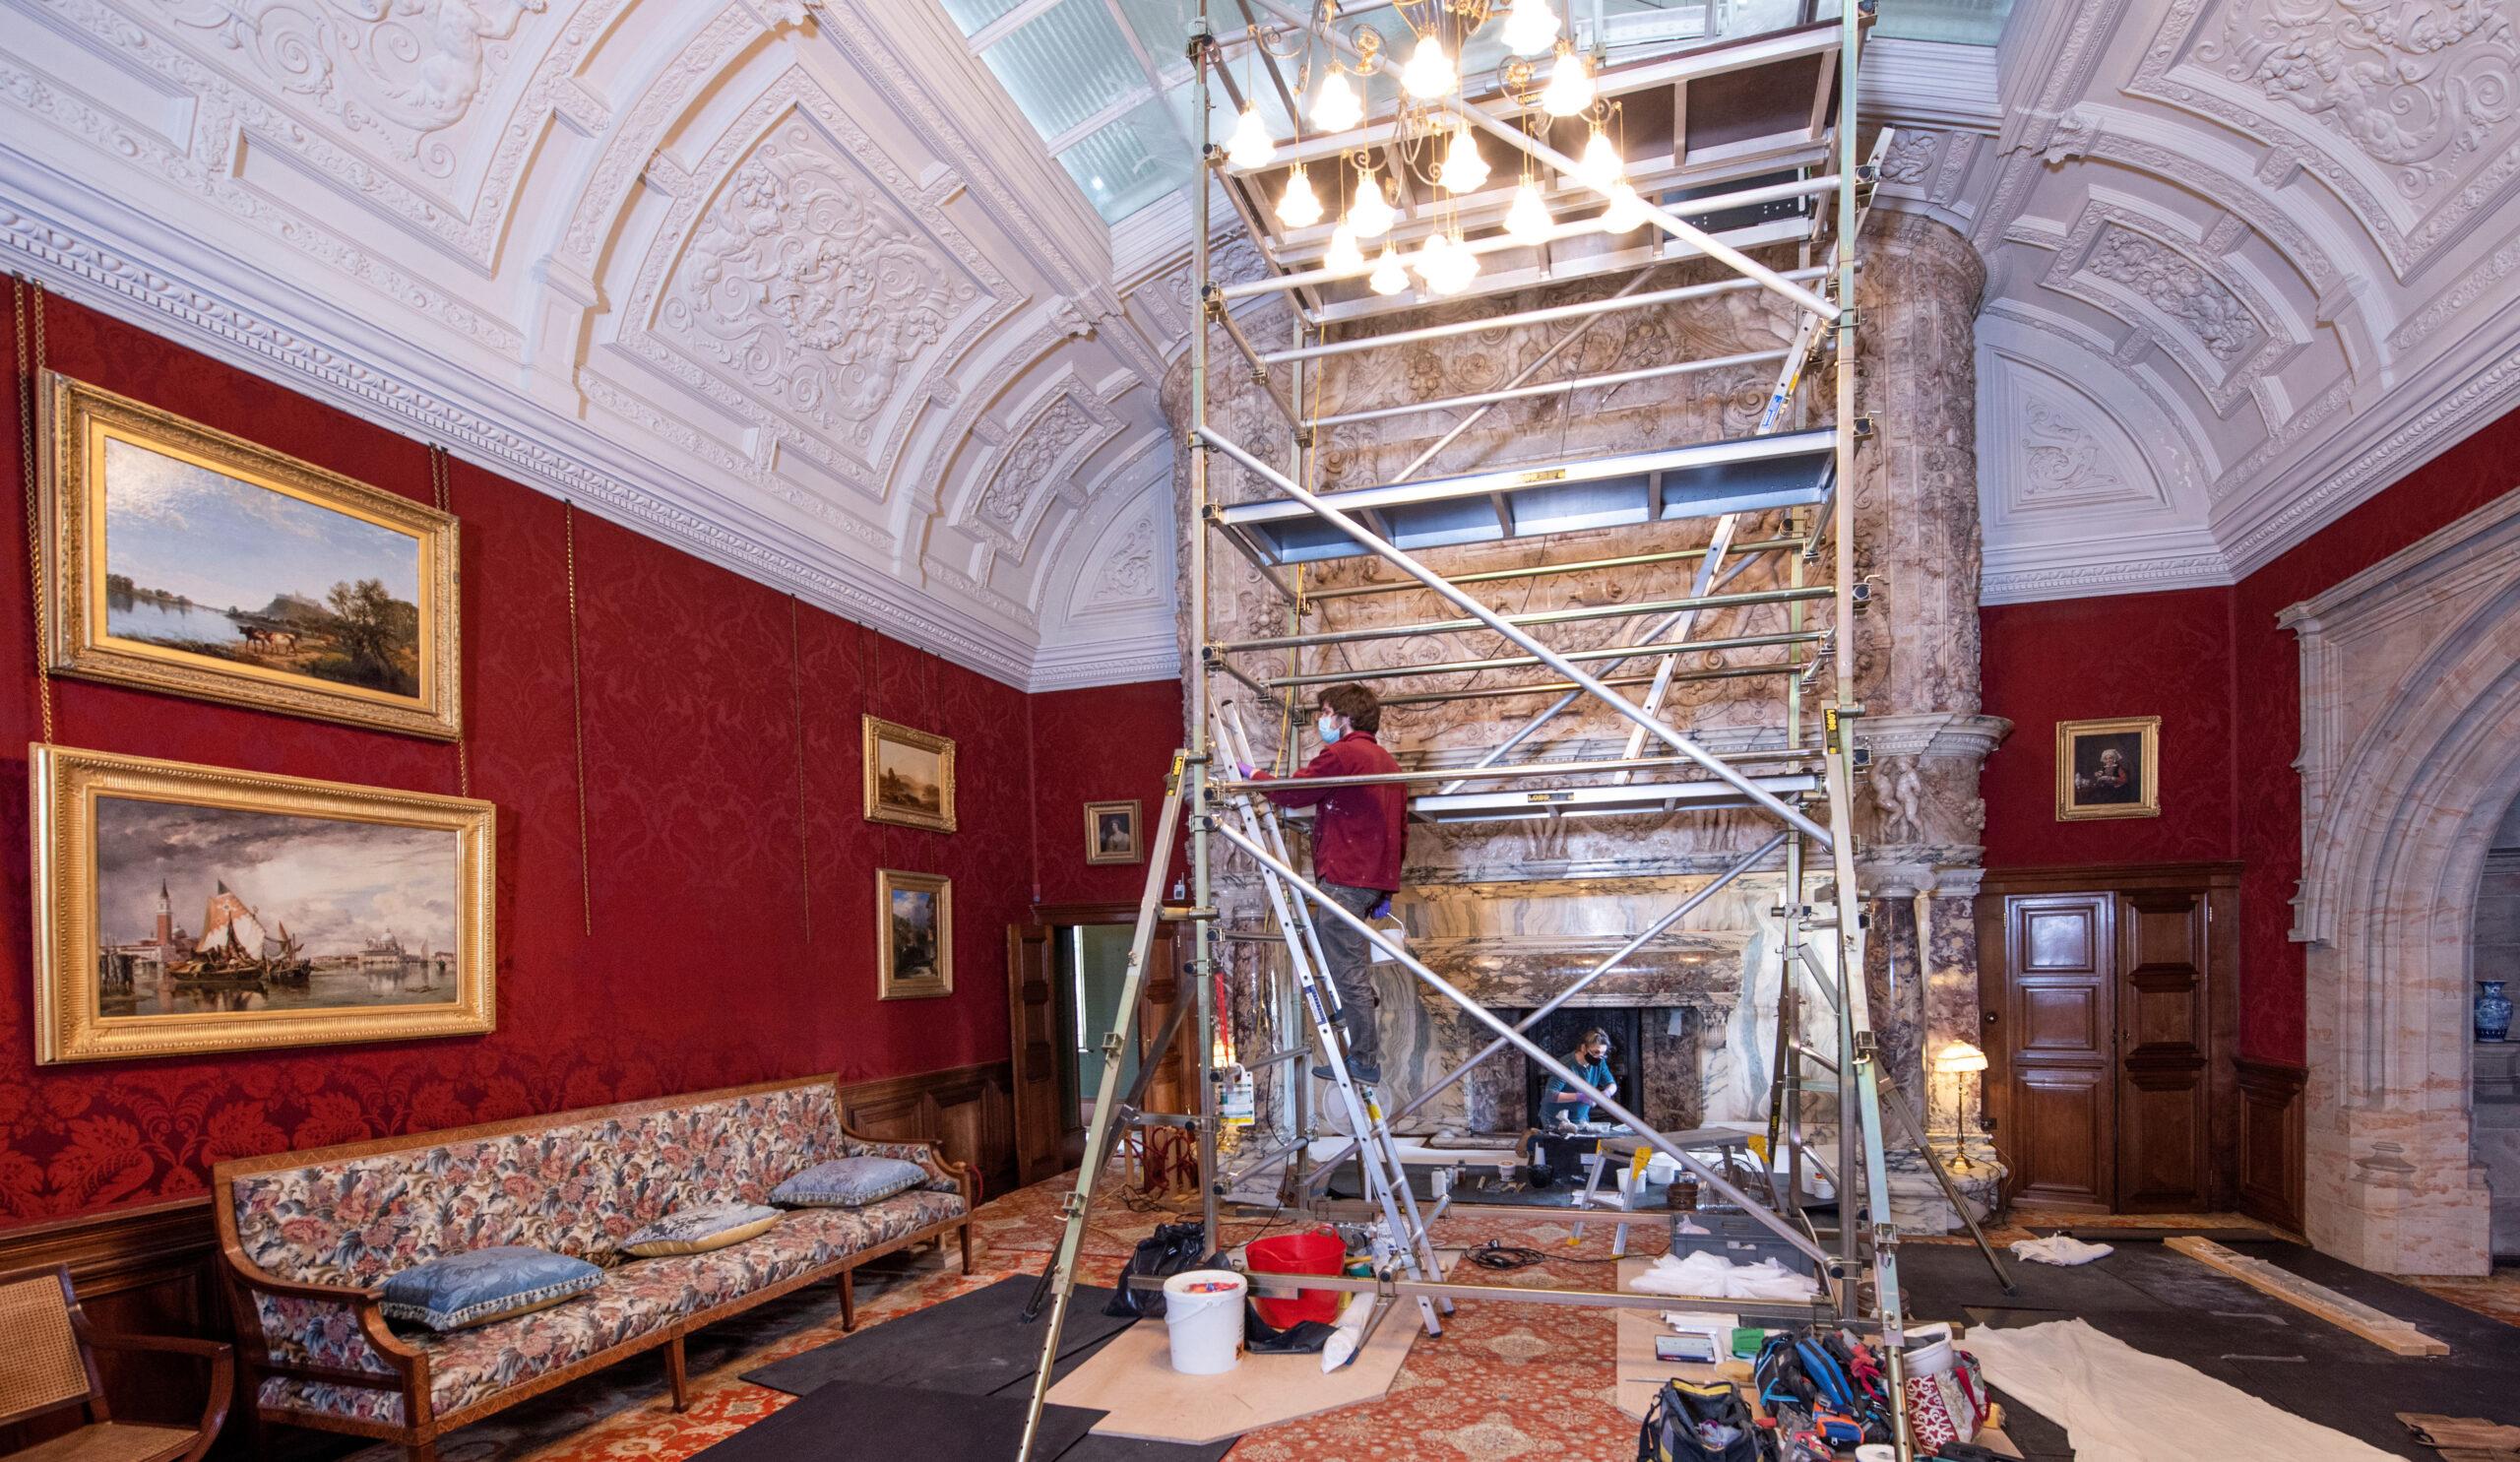 Saving Cragside's Victorian fireplace